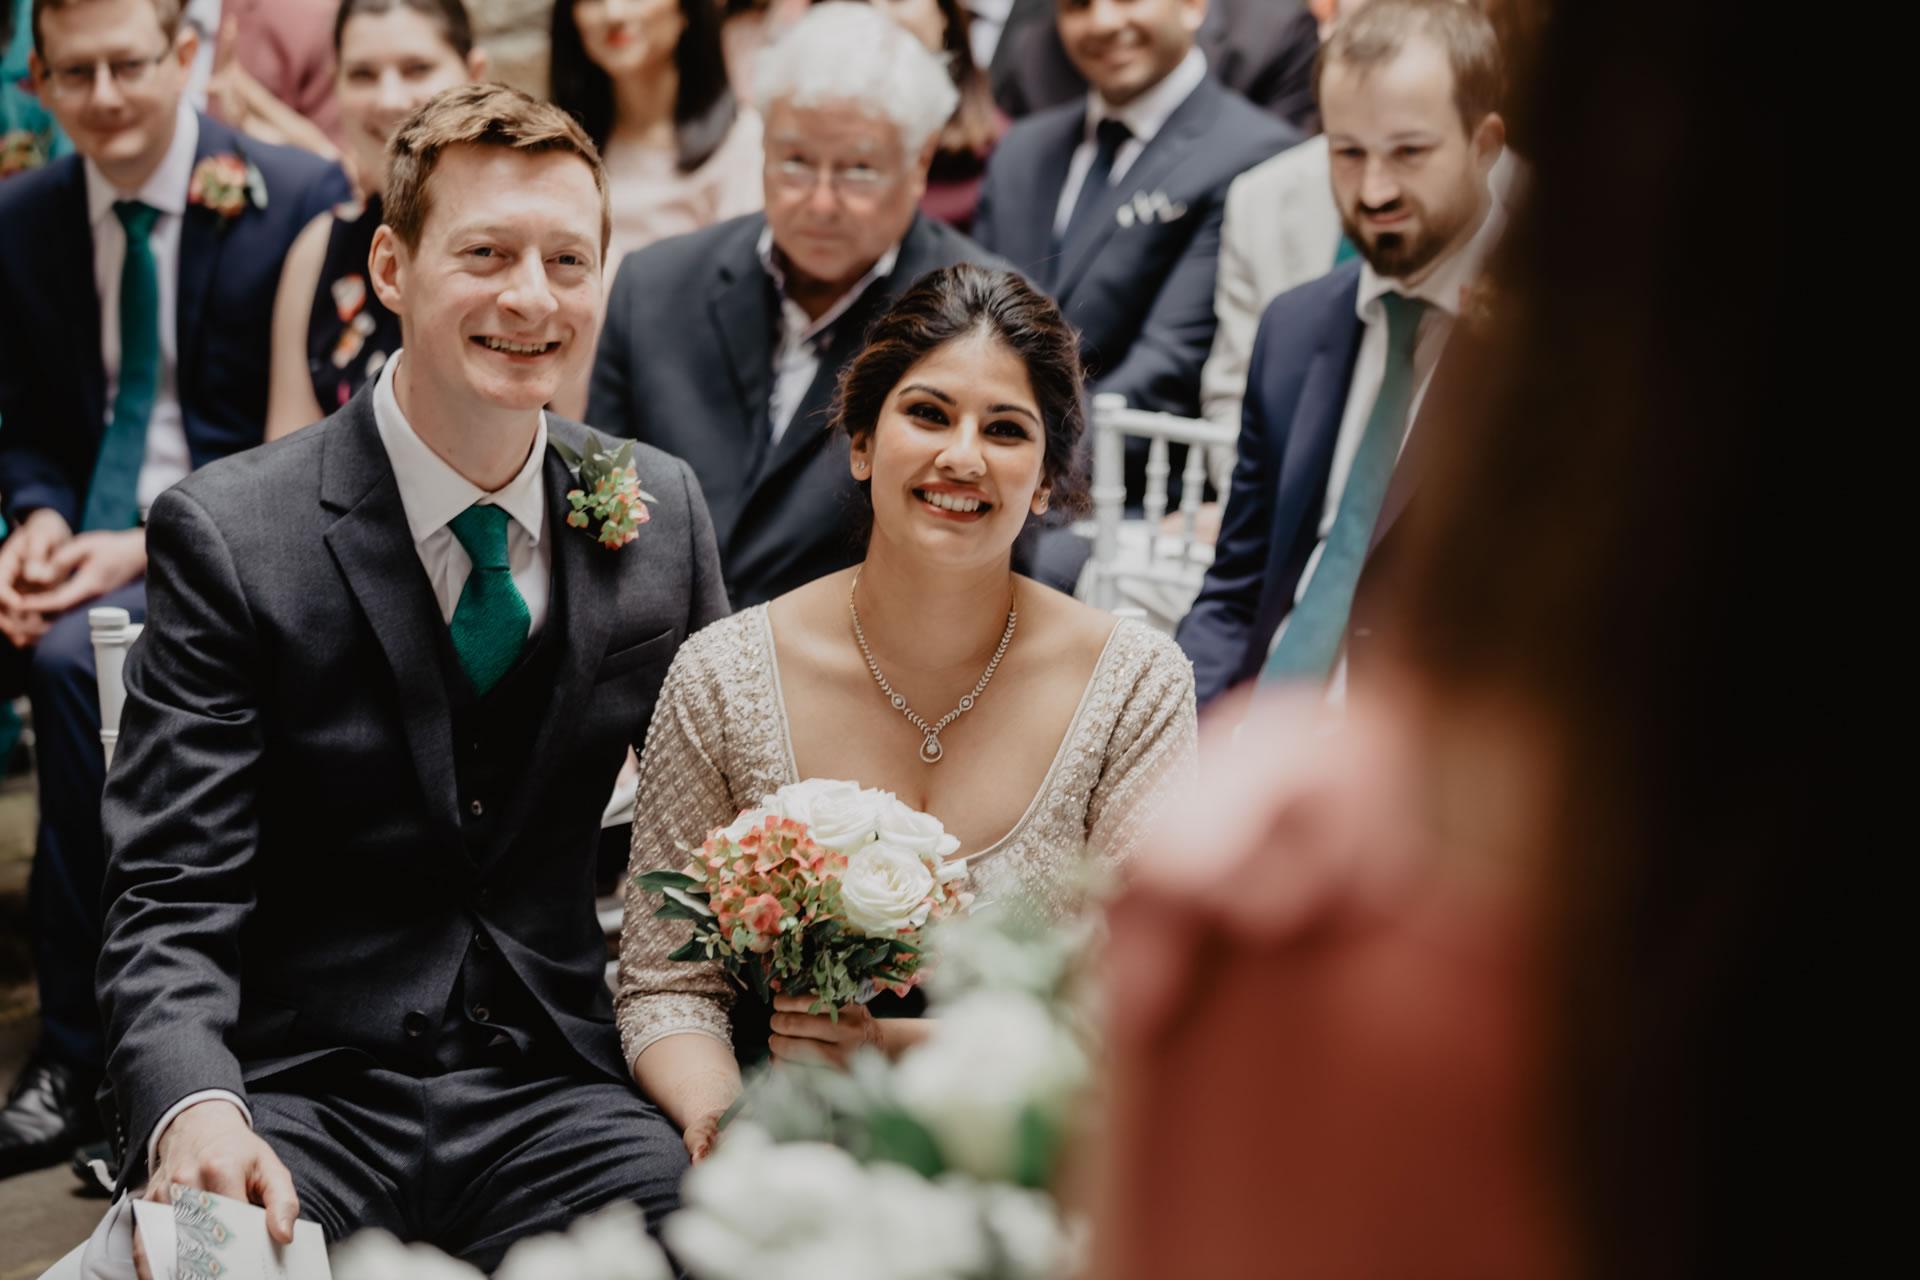 - 47 :: Indian wedding ceremony at Villa Pitiana :: Luxury wedding photography - 46 ::  - 47